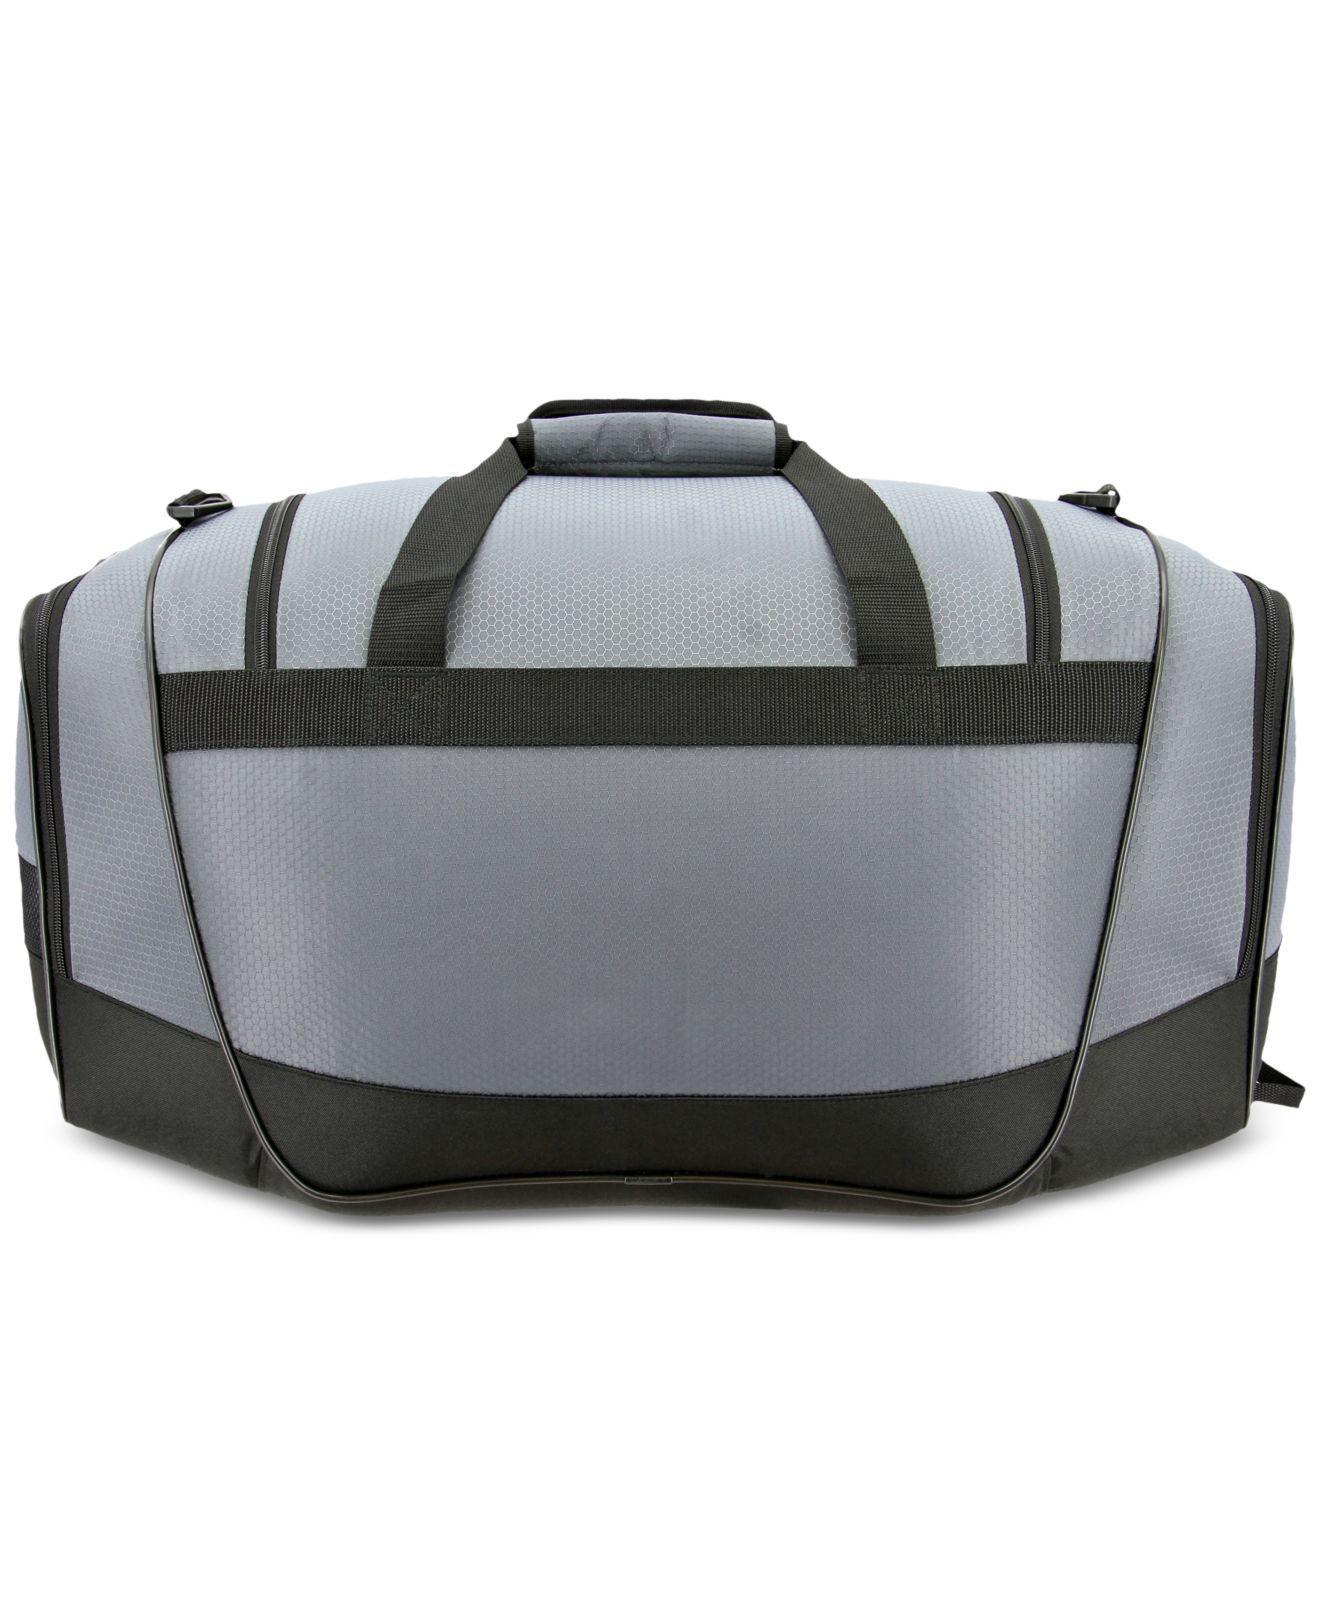 Lyst - adidas Defender Iii Duffel Bag in Gray for Men 5adc637fa1